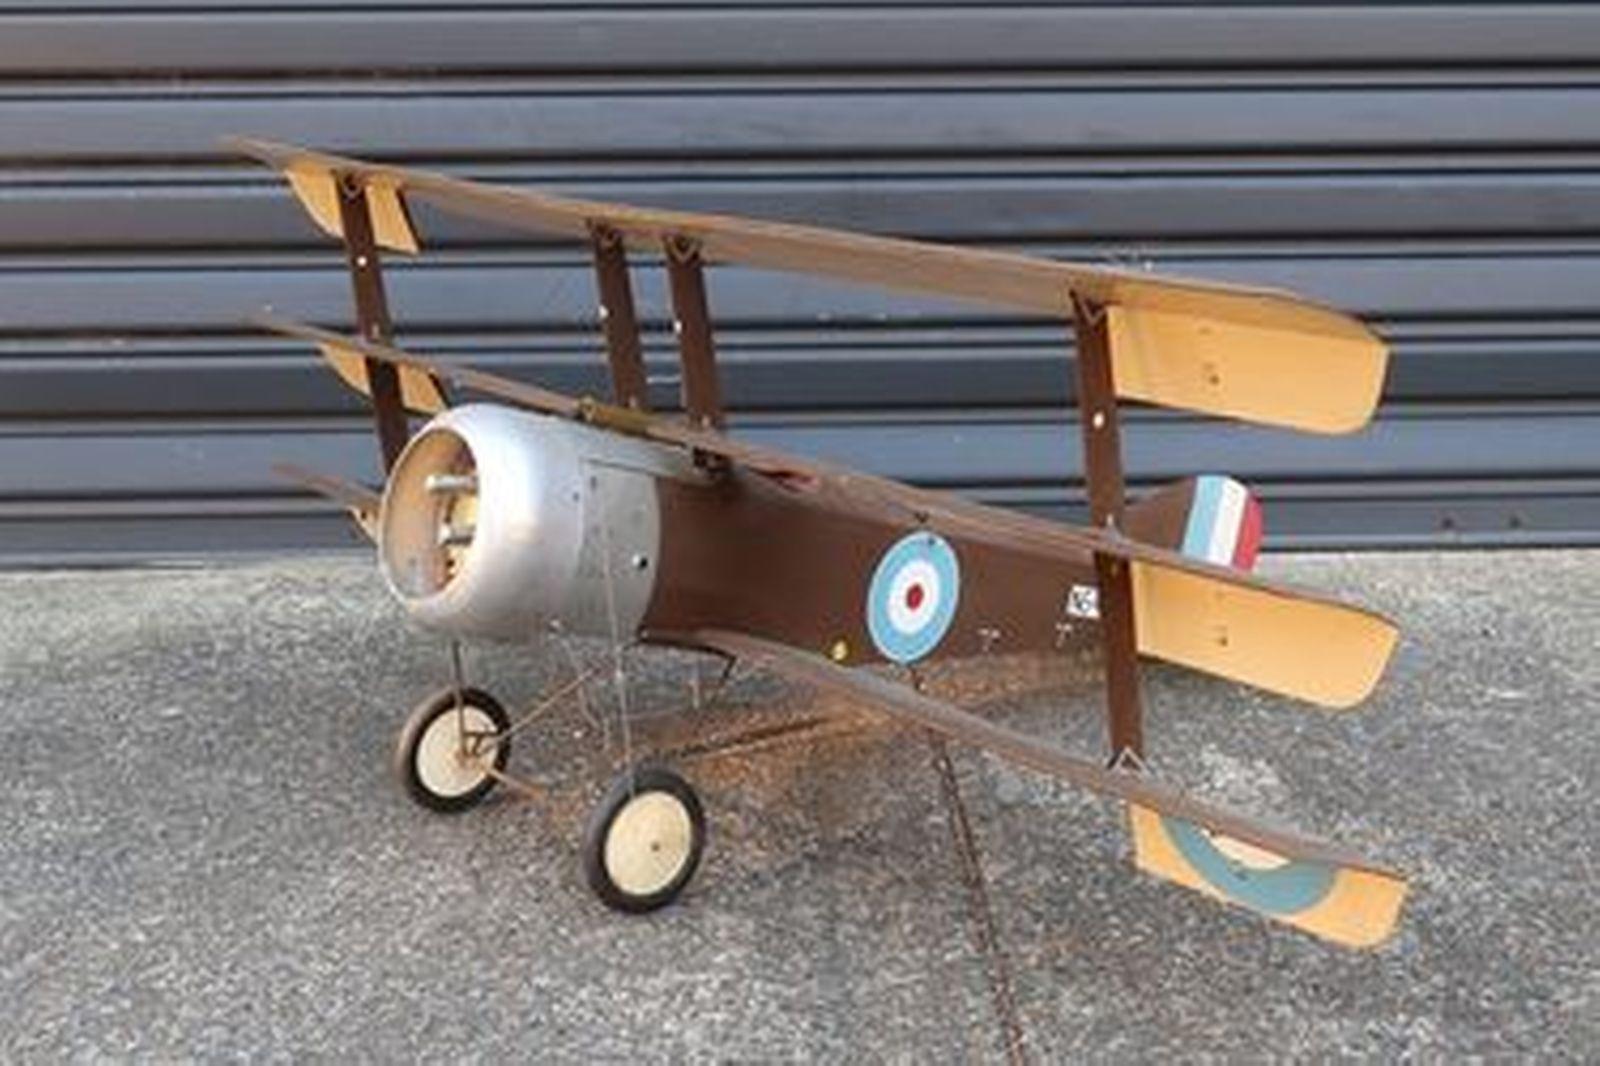 Model Plane - Sopwith Triplane (1.3m wingspan)